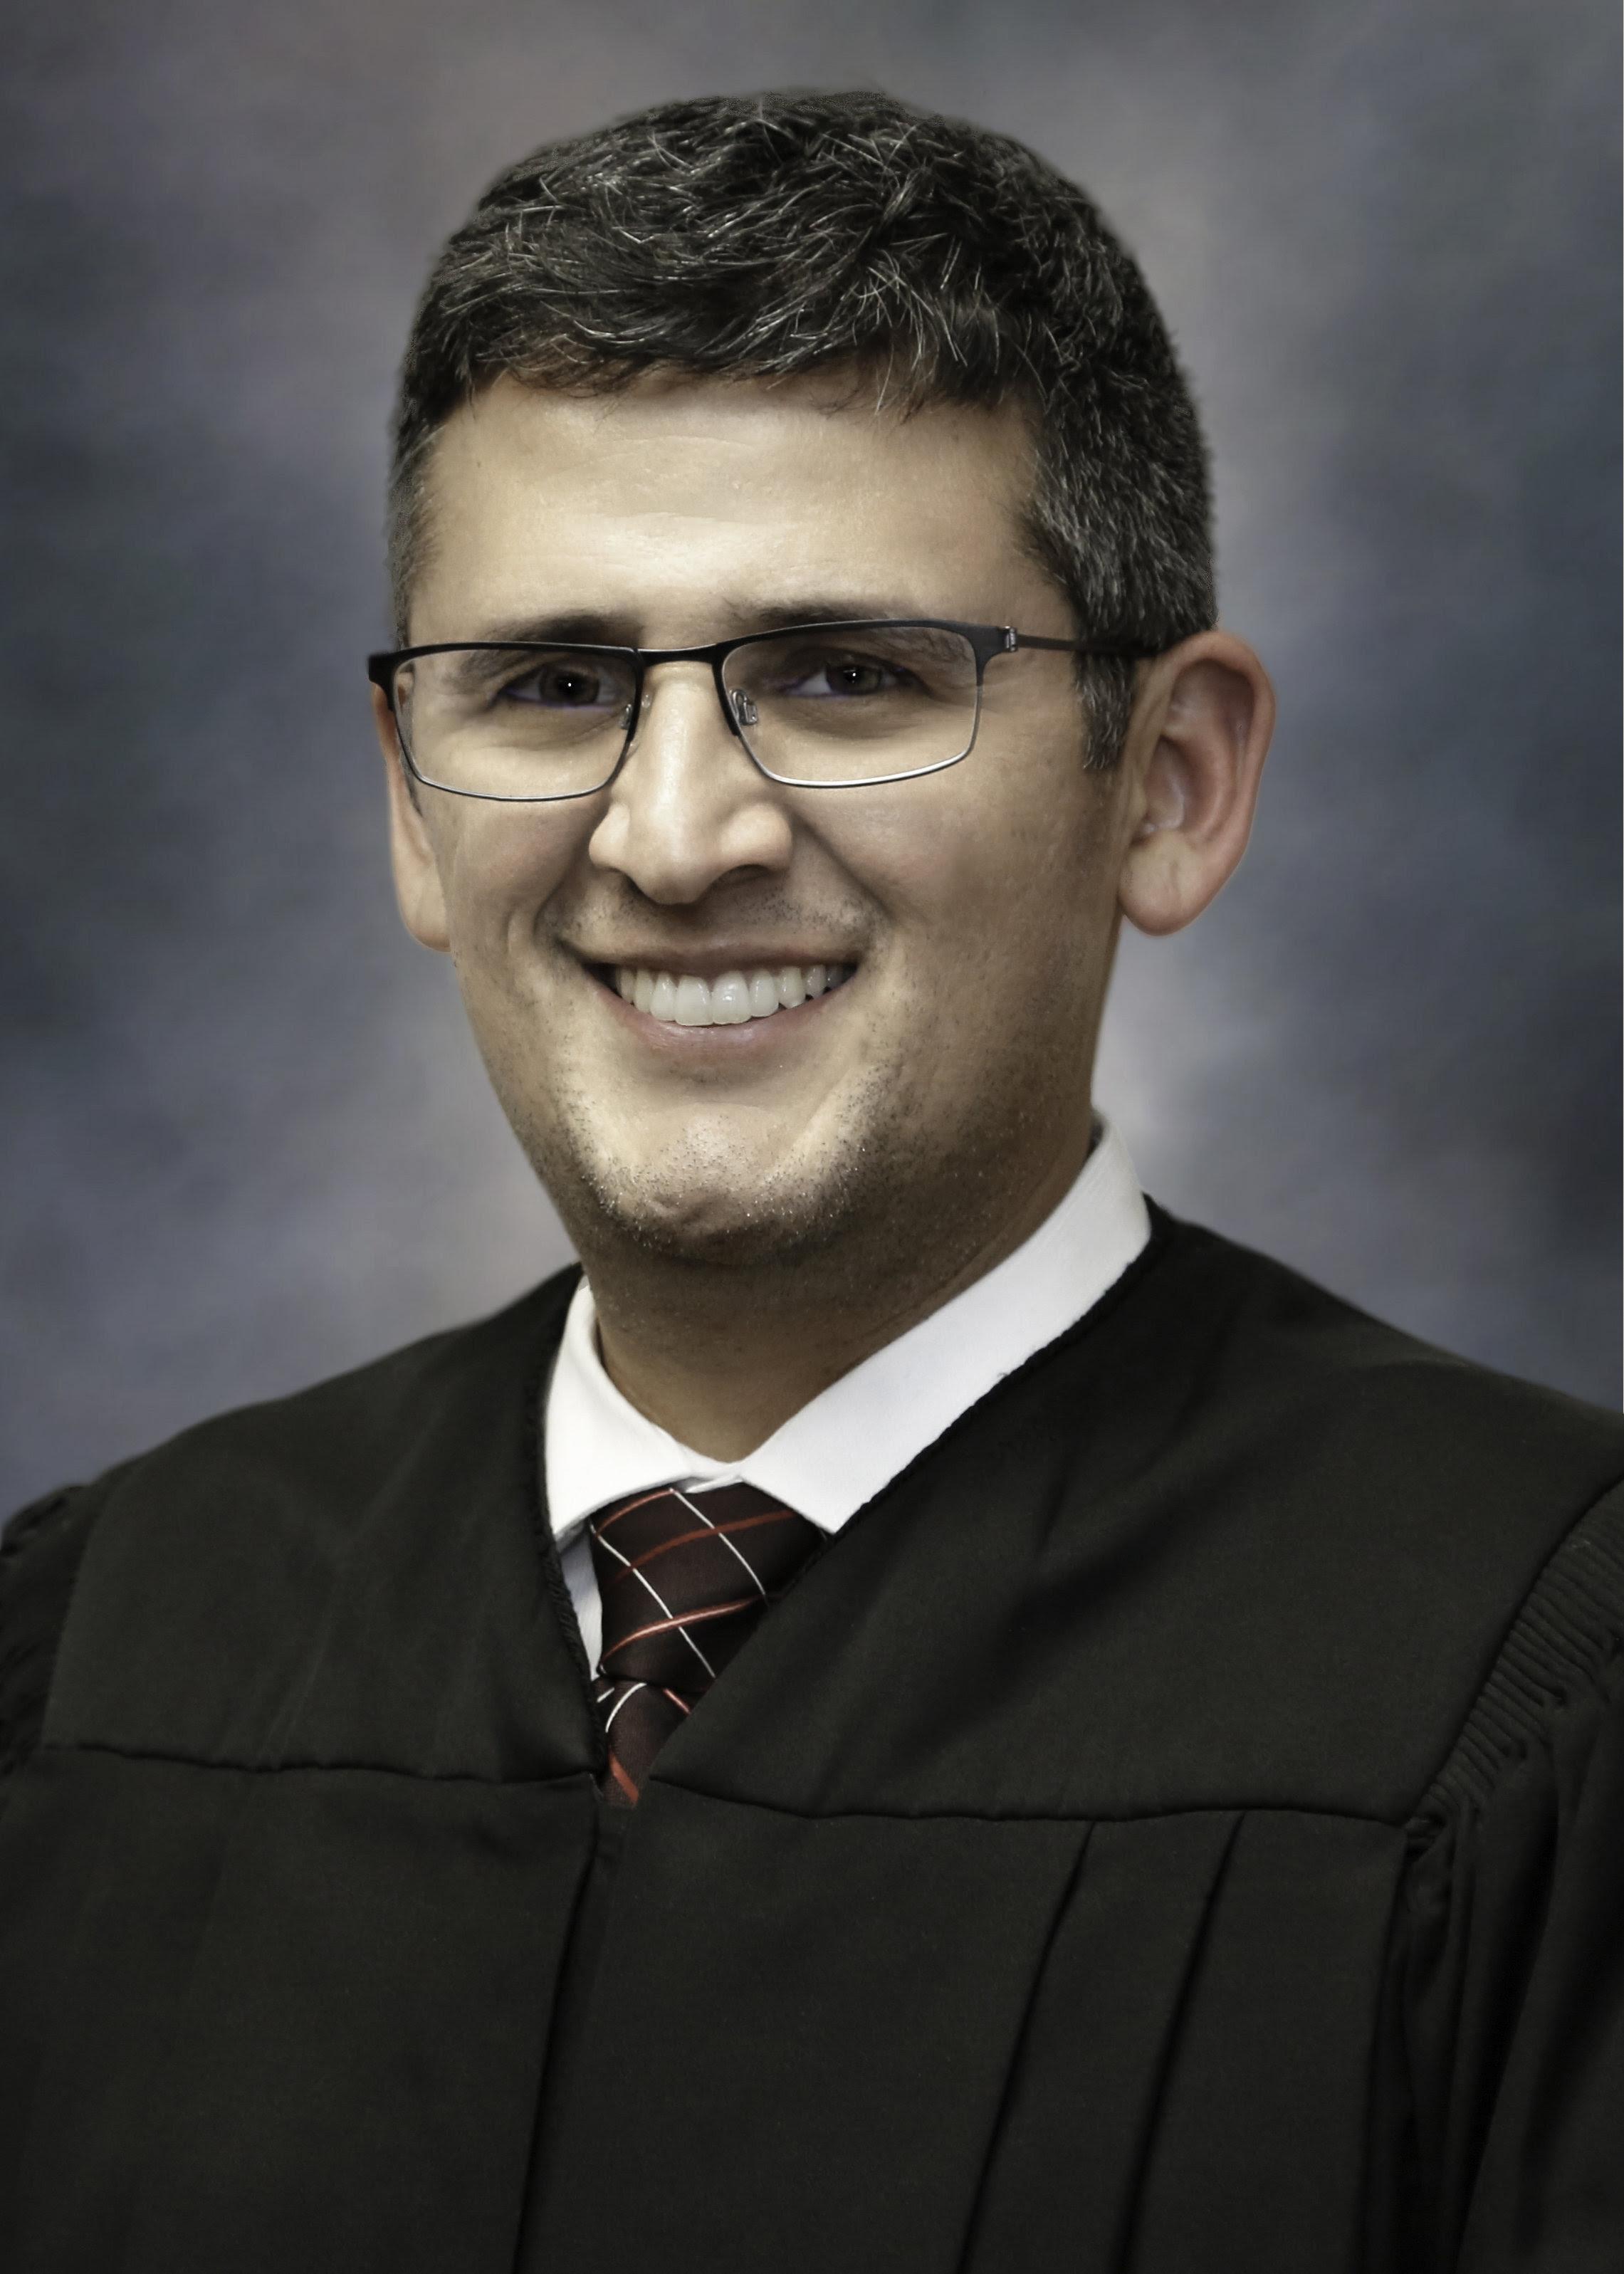 Hon. Hernaldo J. Baltodano